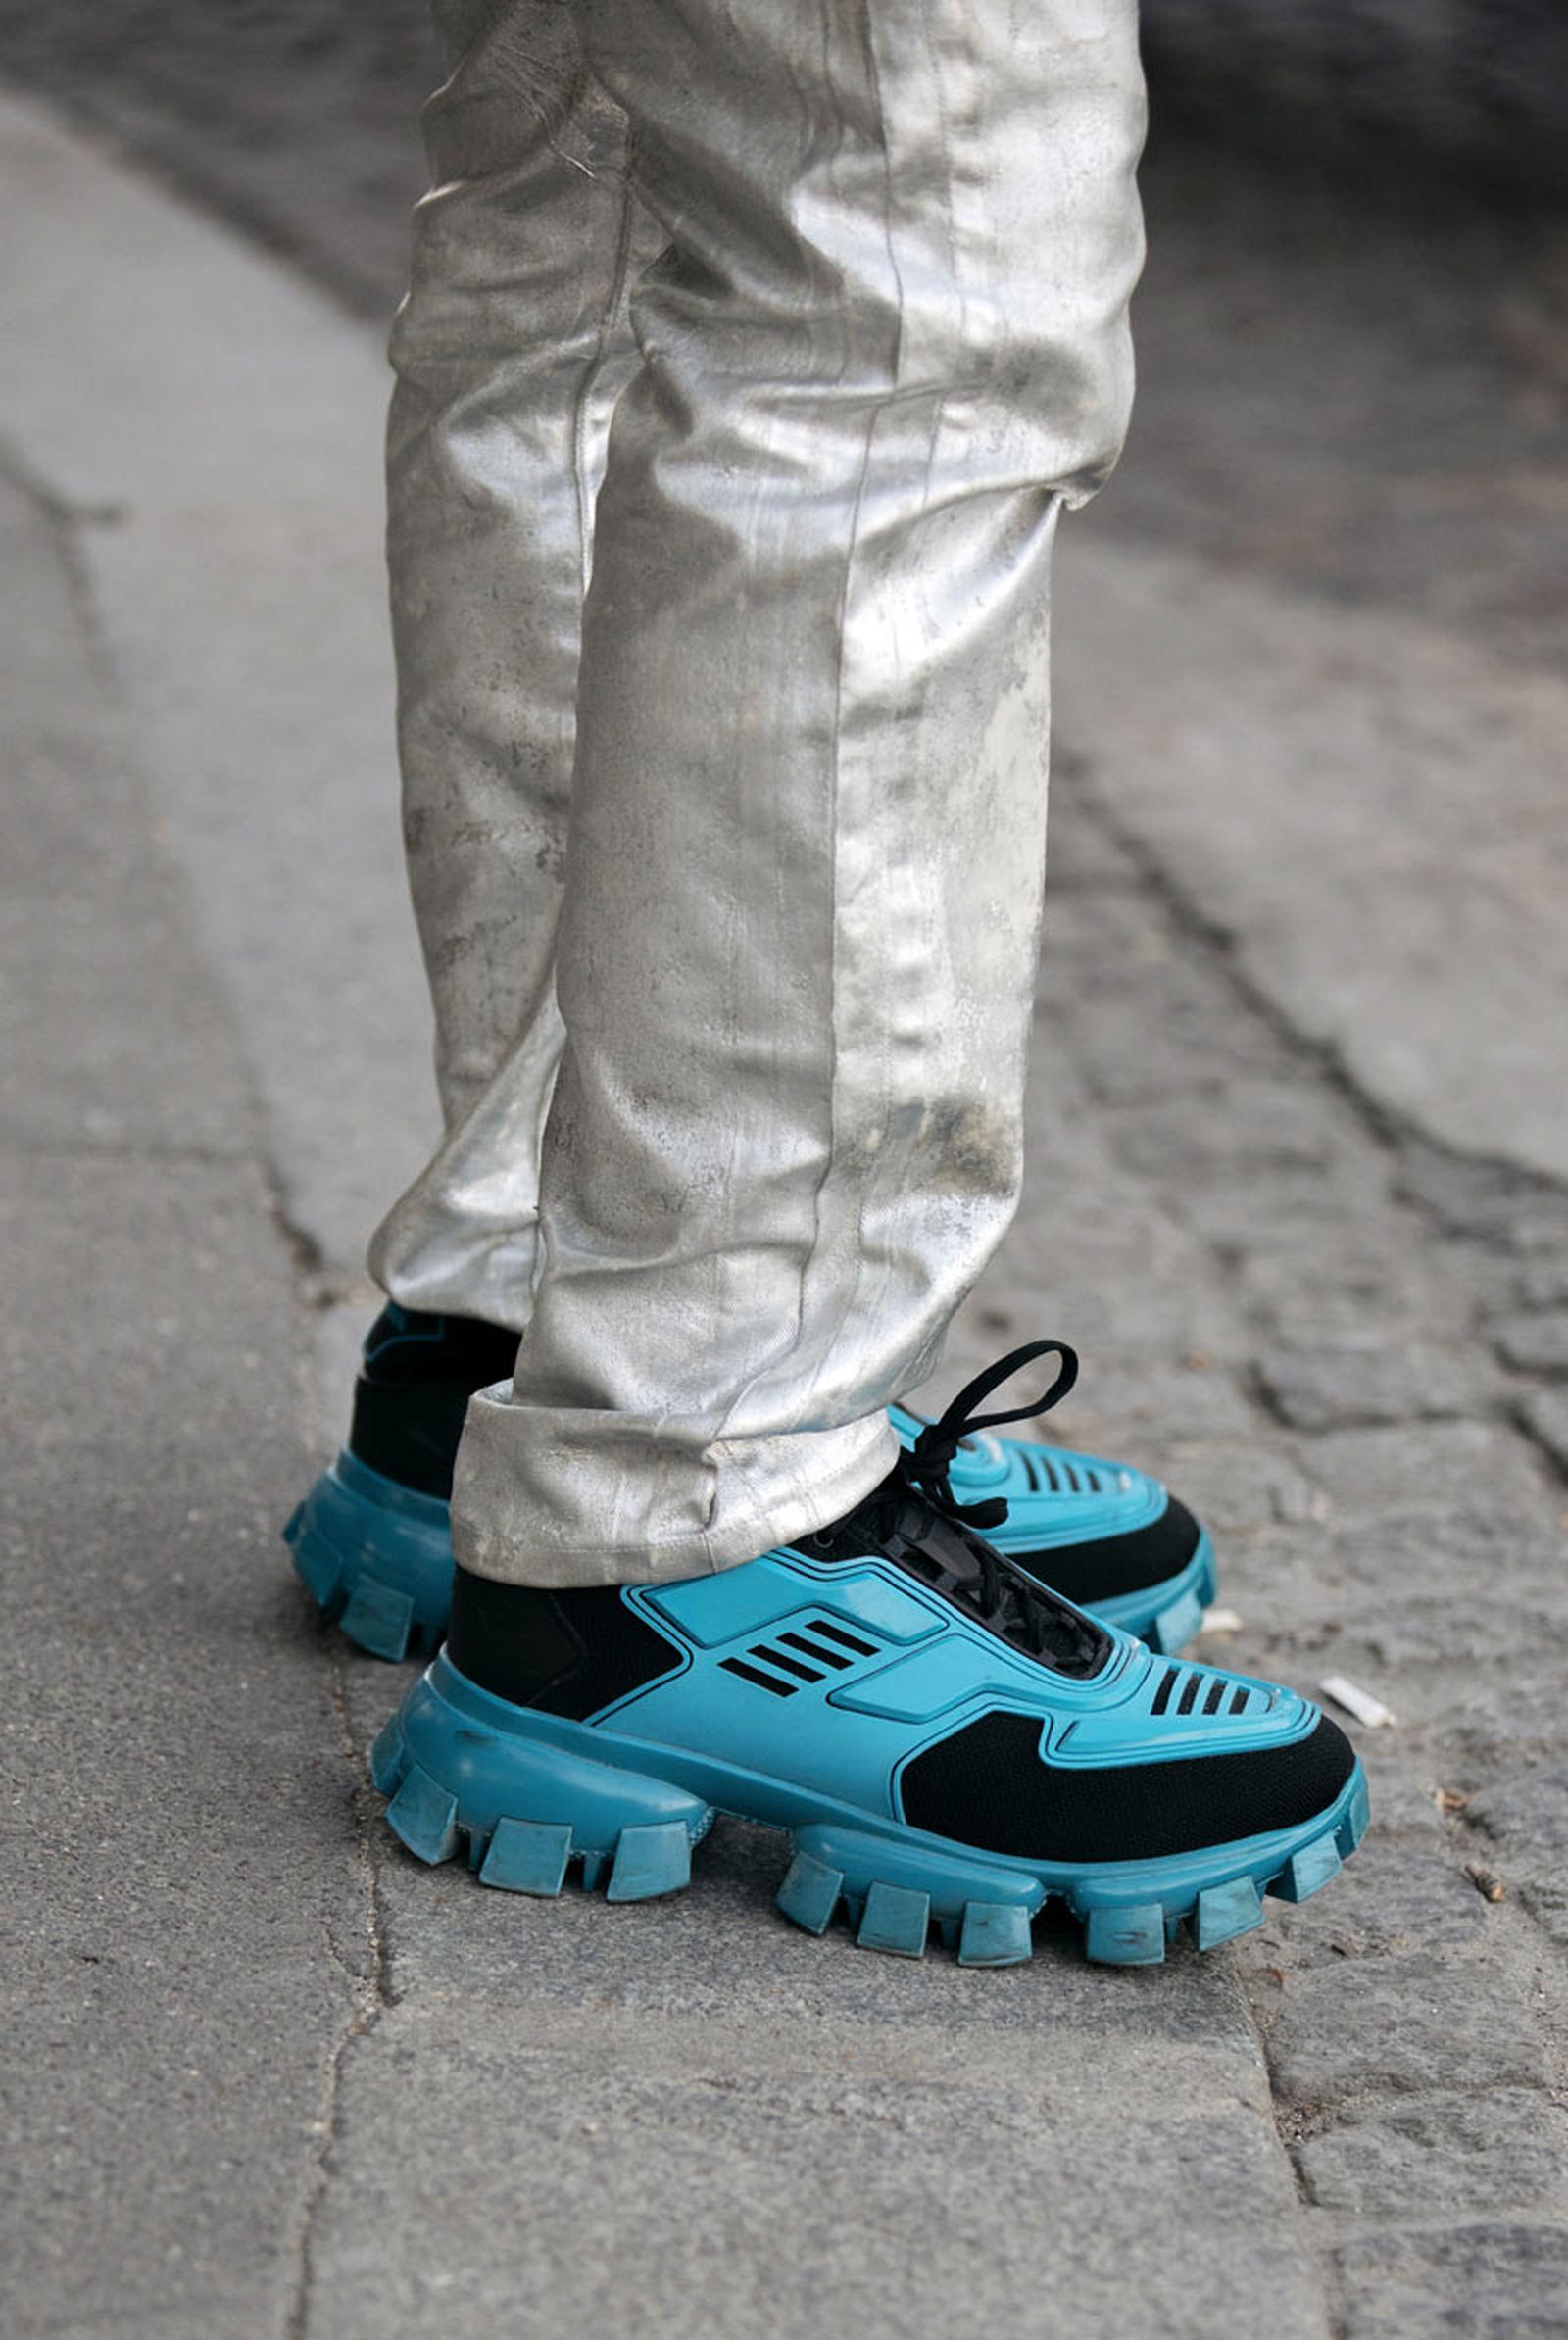 paris fashion week ss20 sneakers 04 Nike comme des garcons li ning